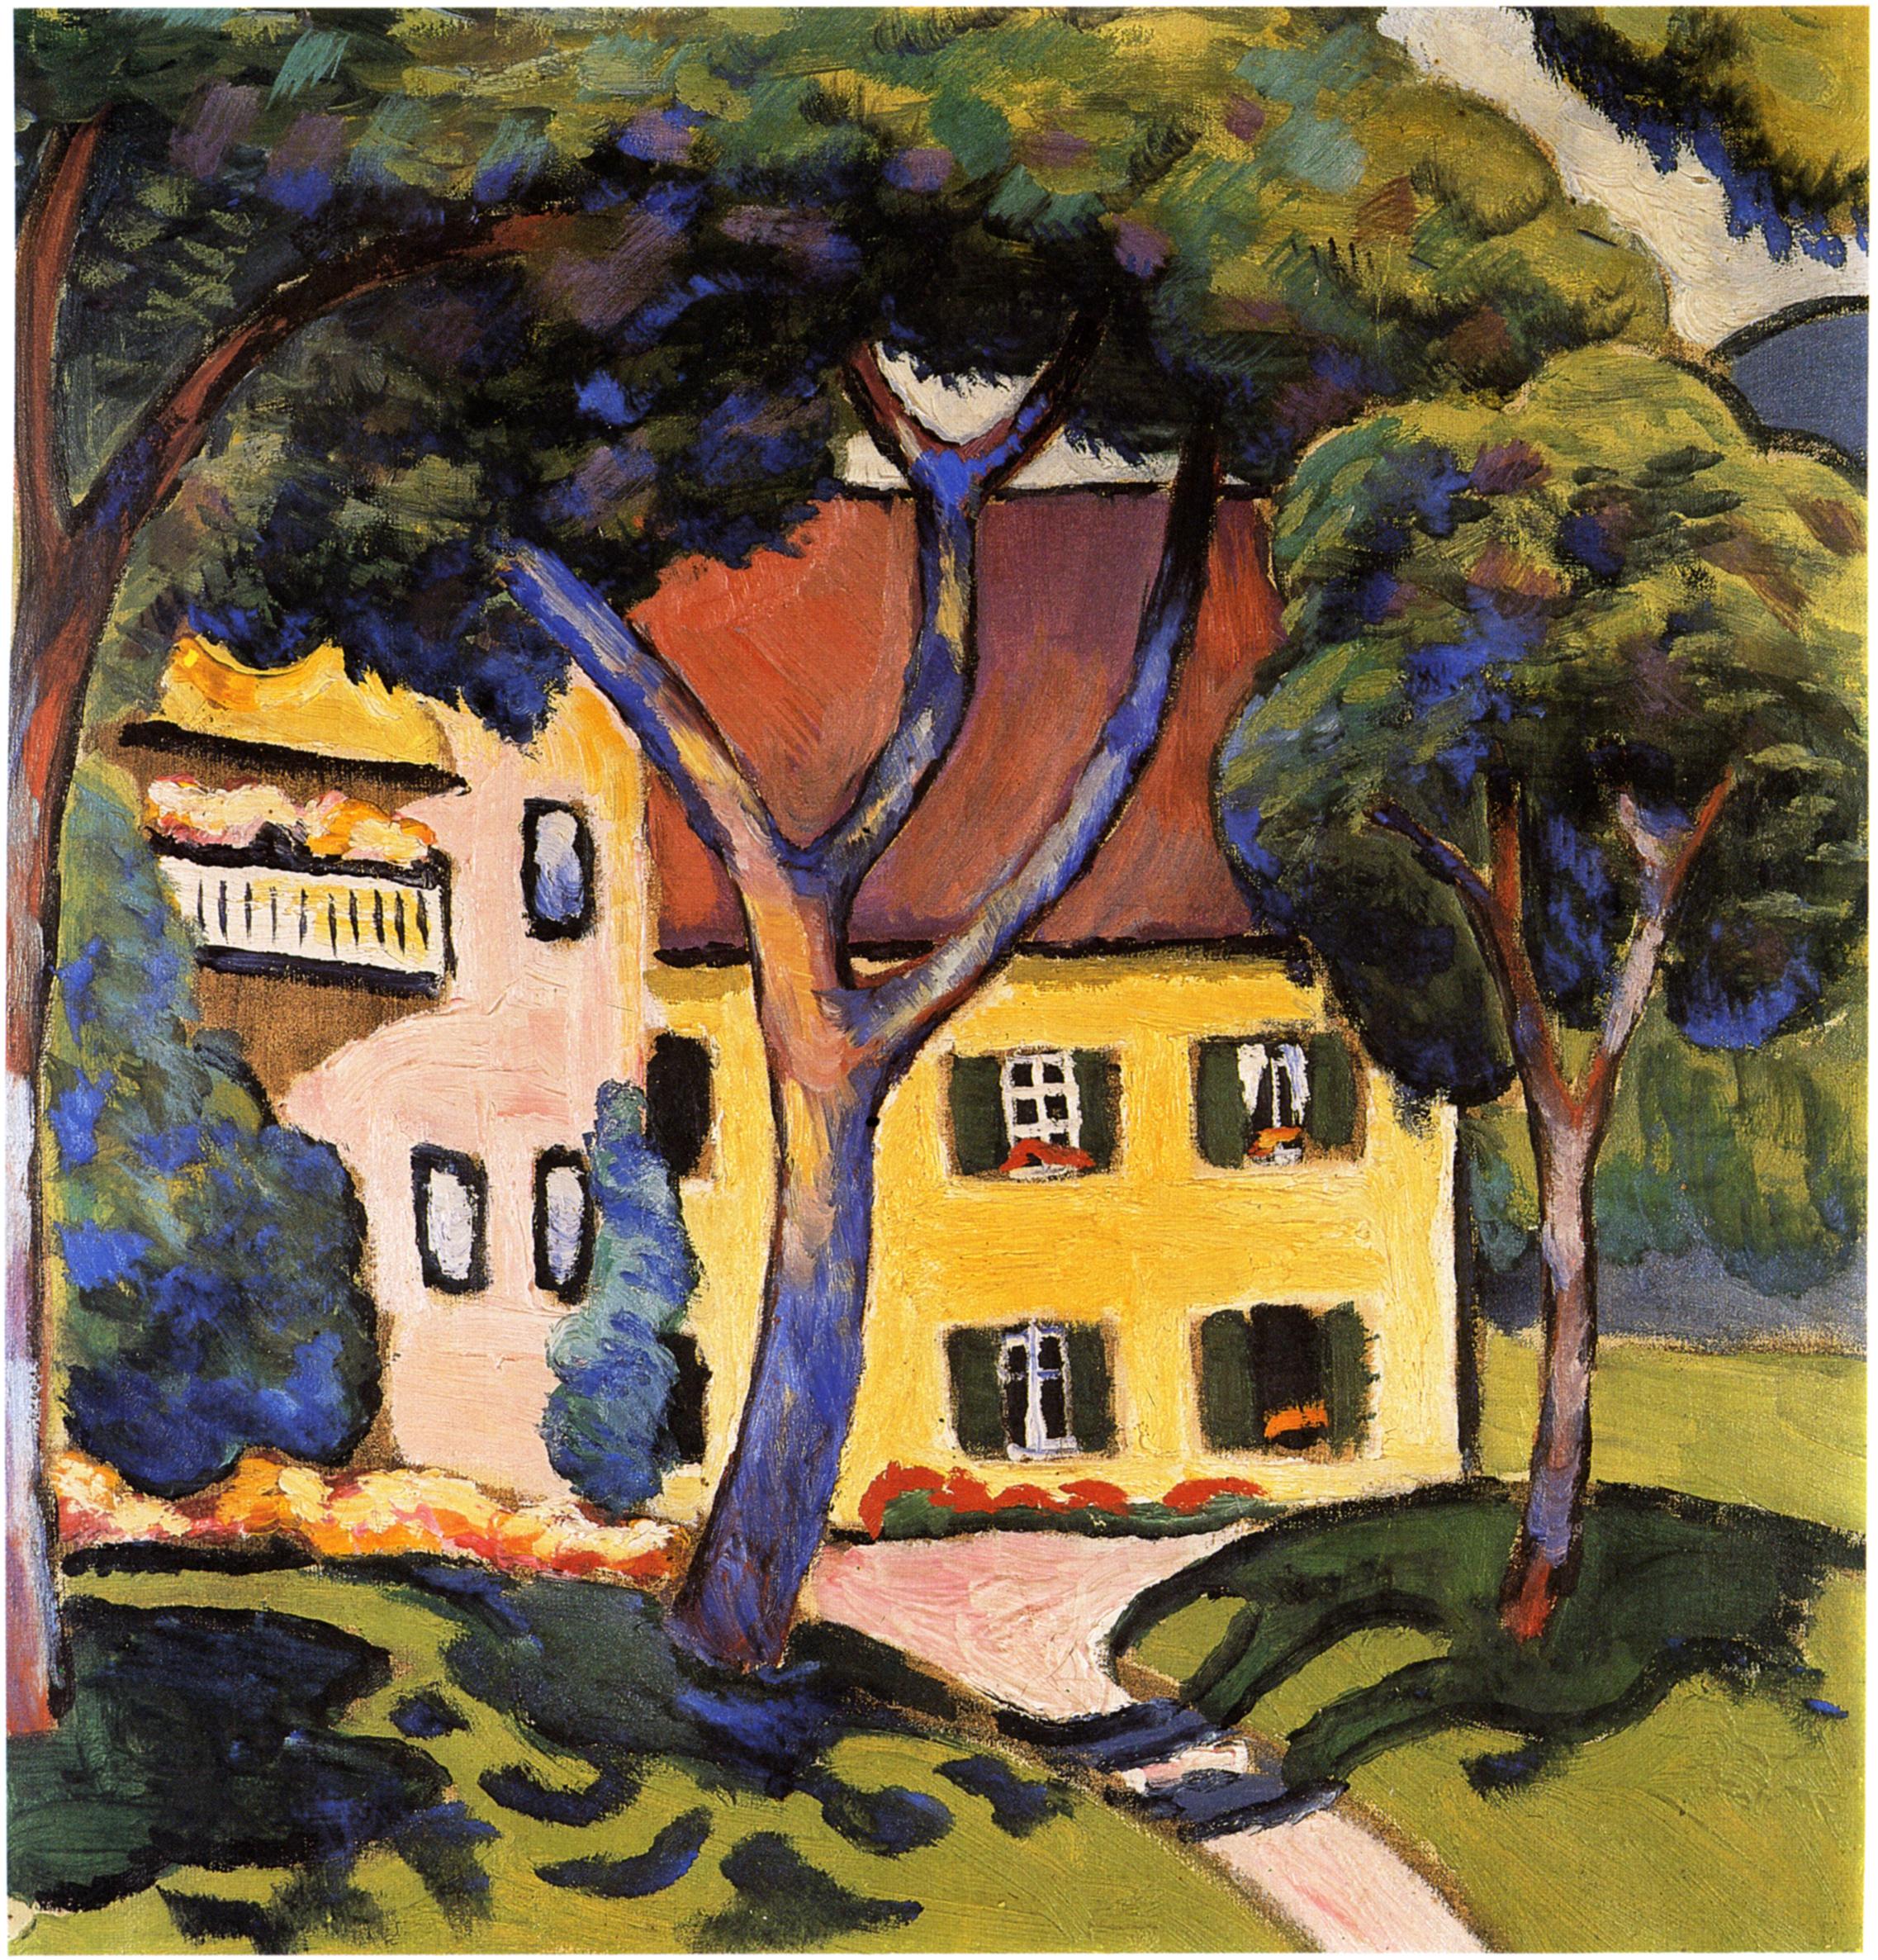 House Landscape Images: House In A Landscape